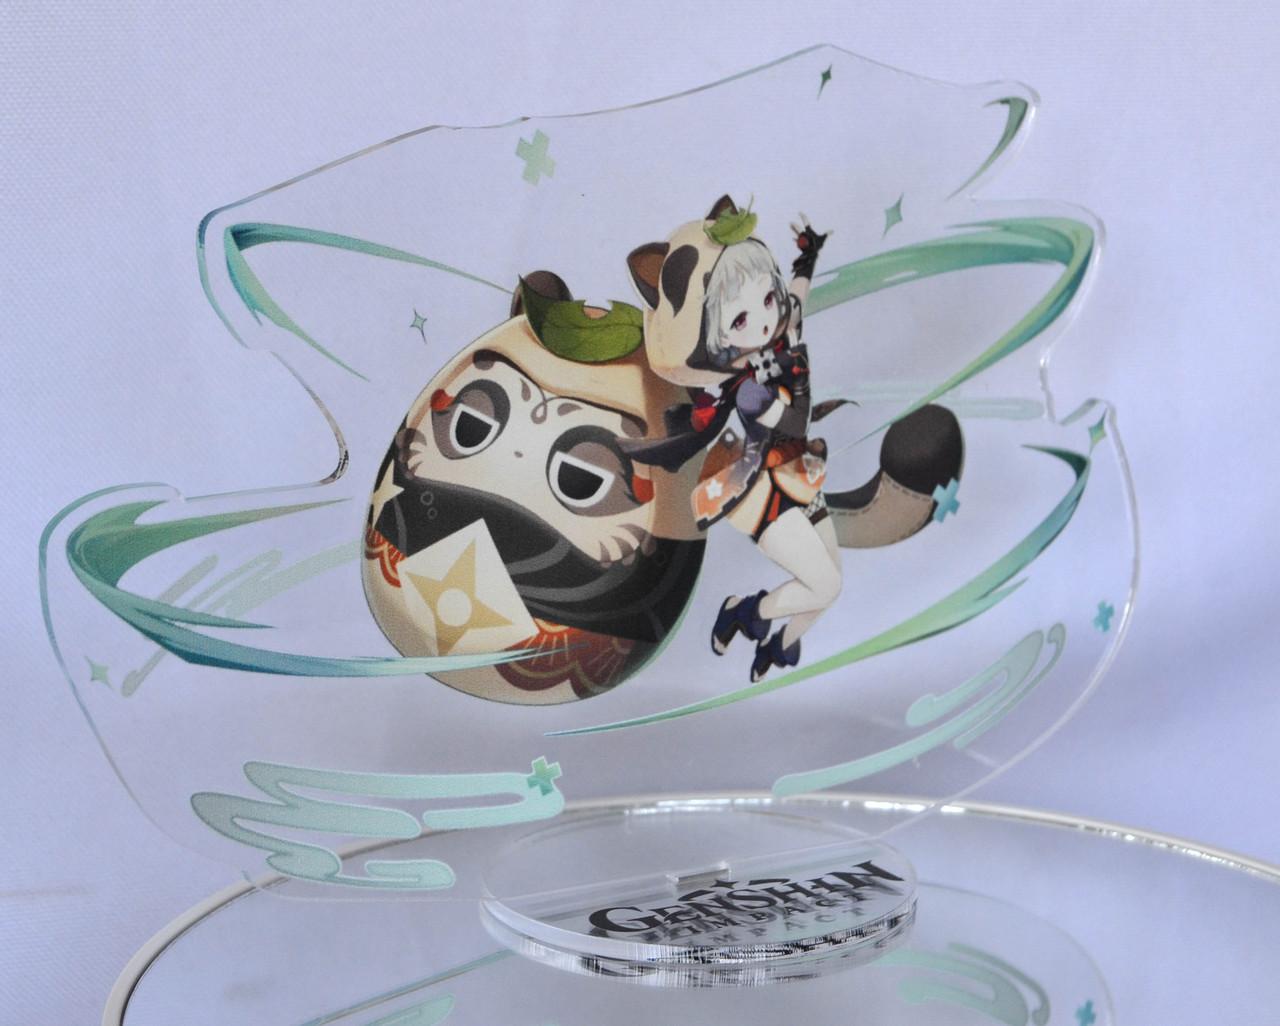 Акриловий стенд Genshin Impact - Sayu    Саю, 15 см